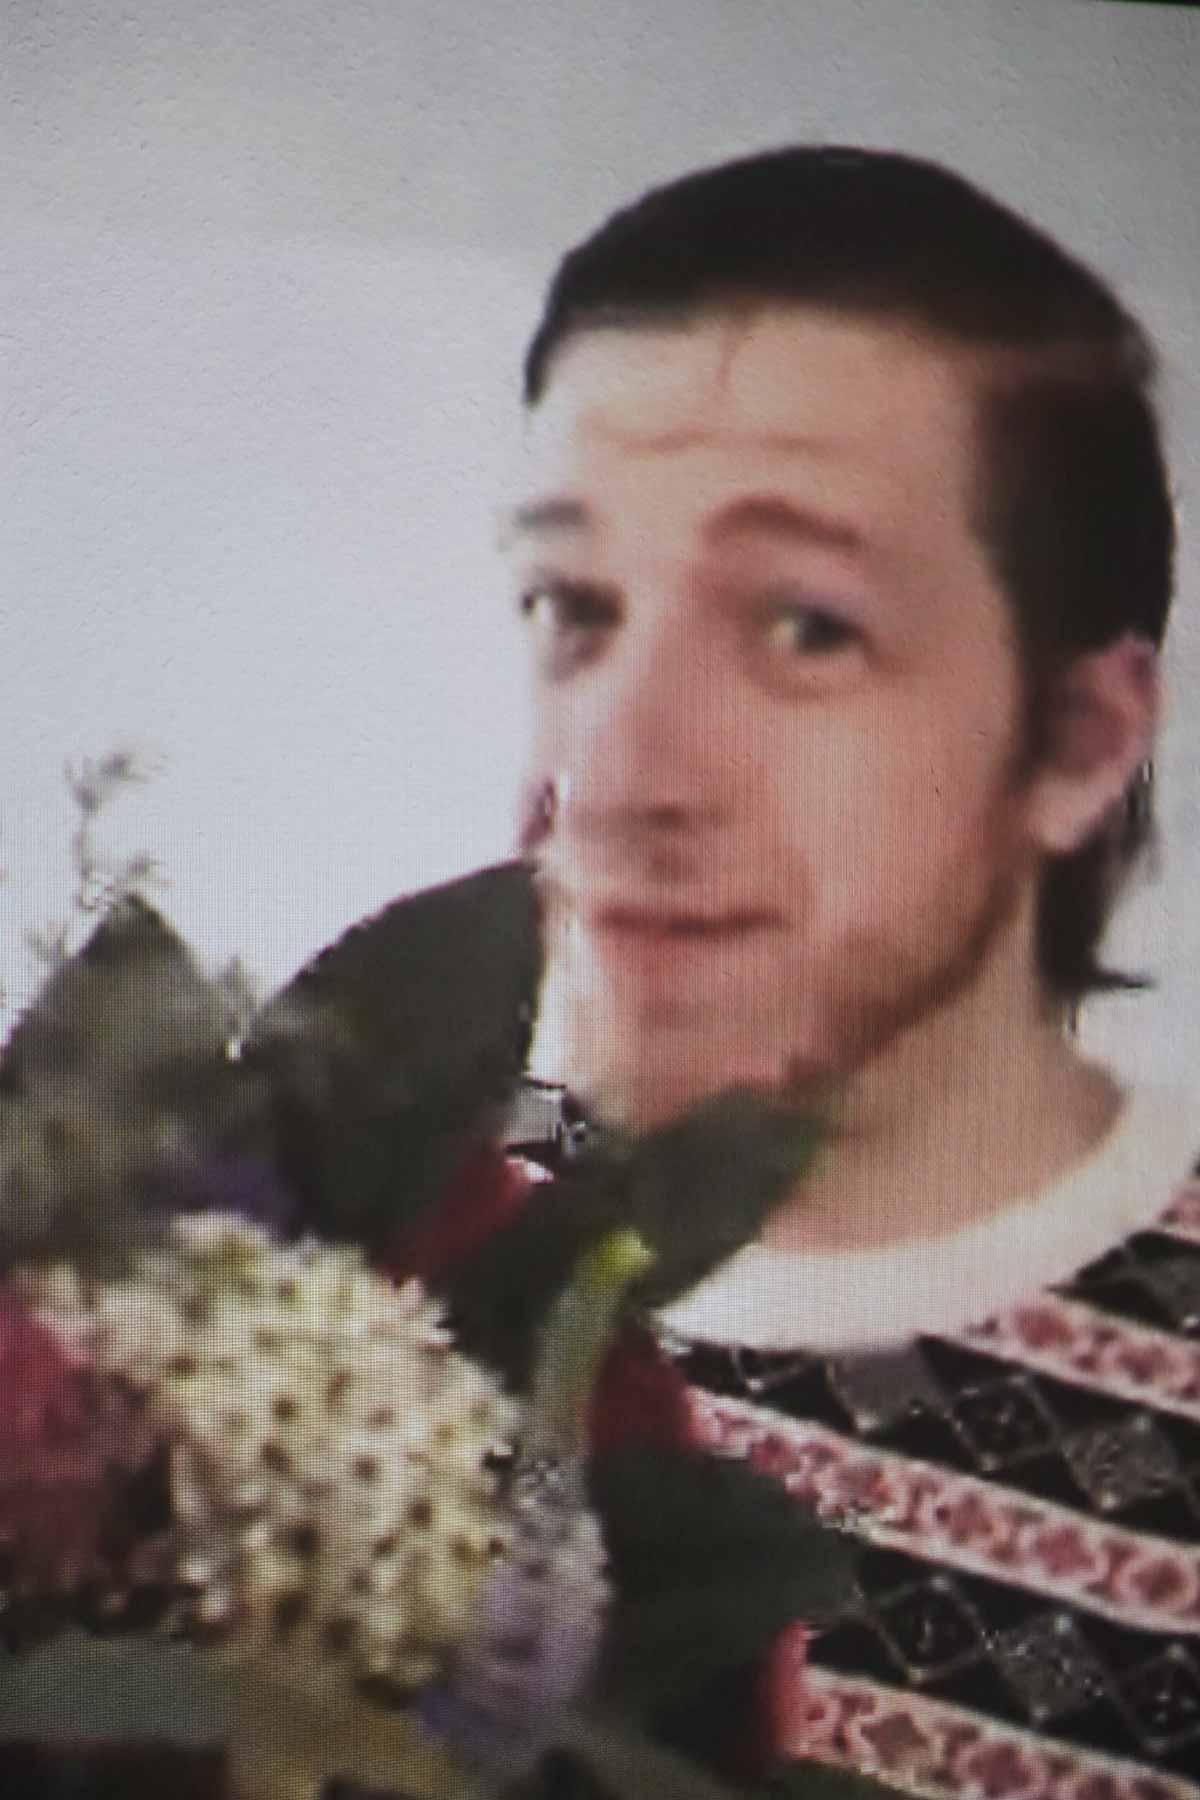 PHILIP, 24, DUESSELDORF, GERMANY philipandandand35